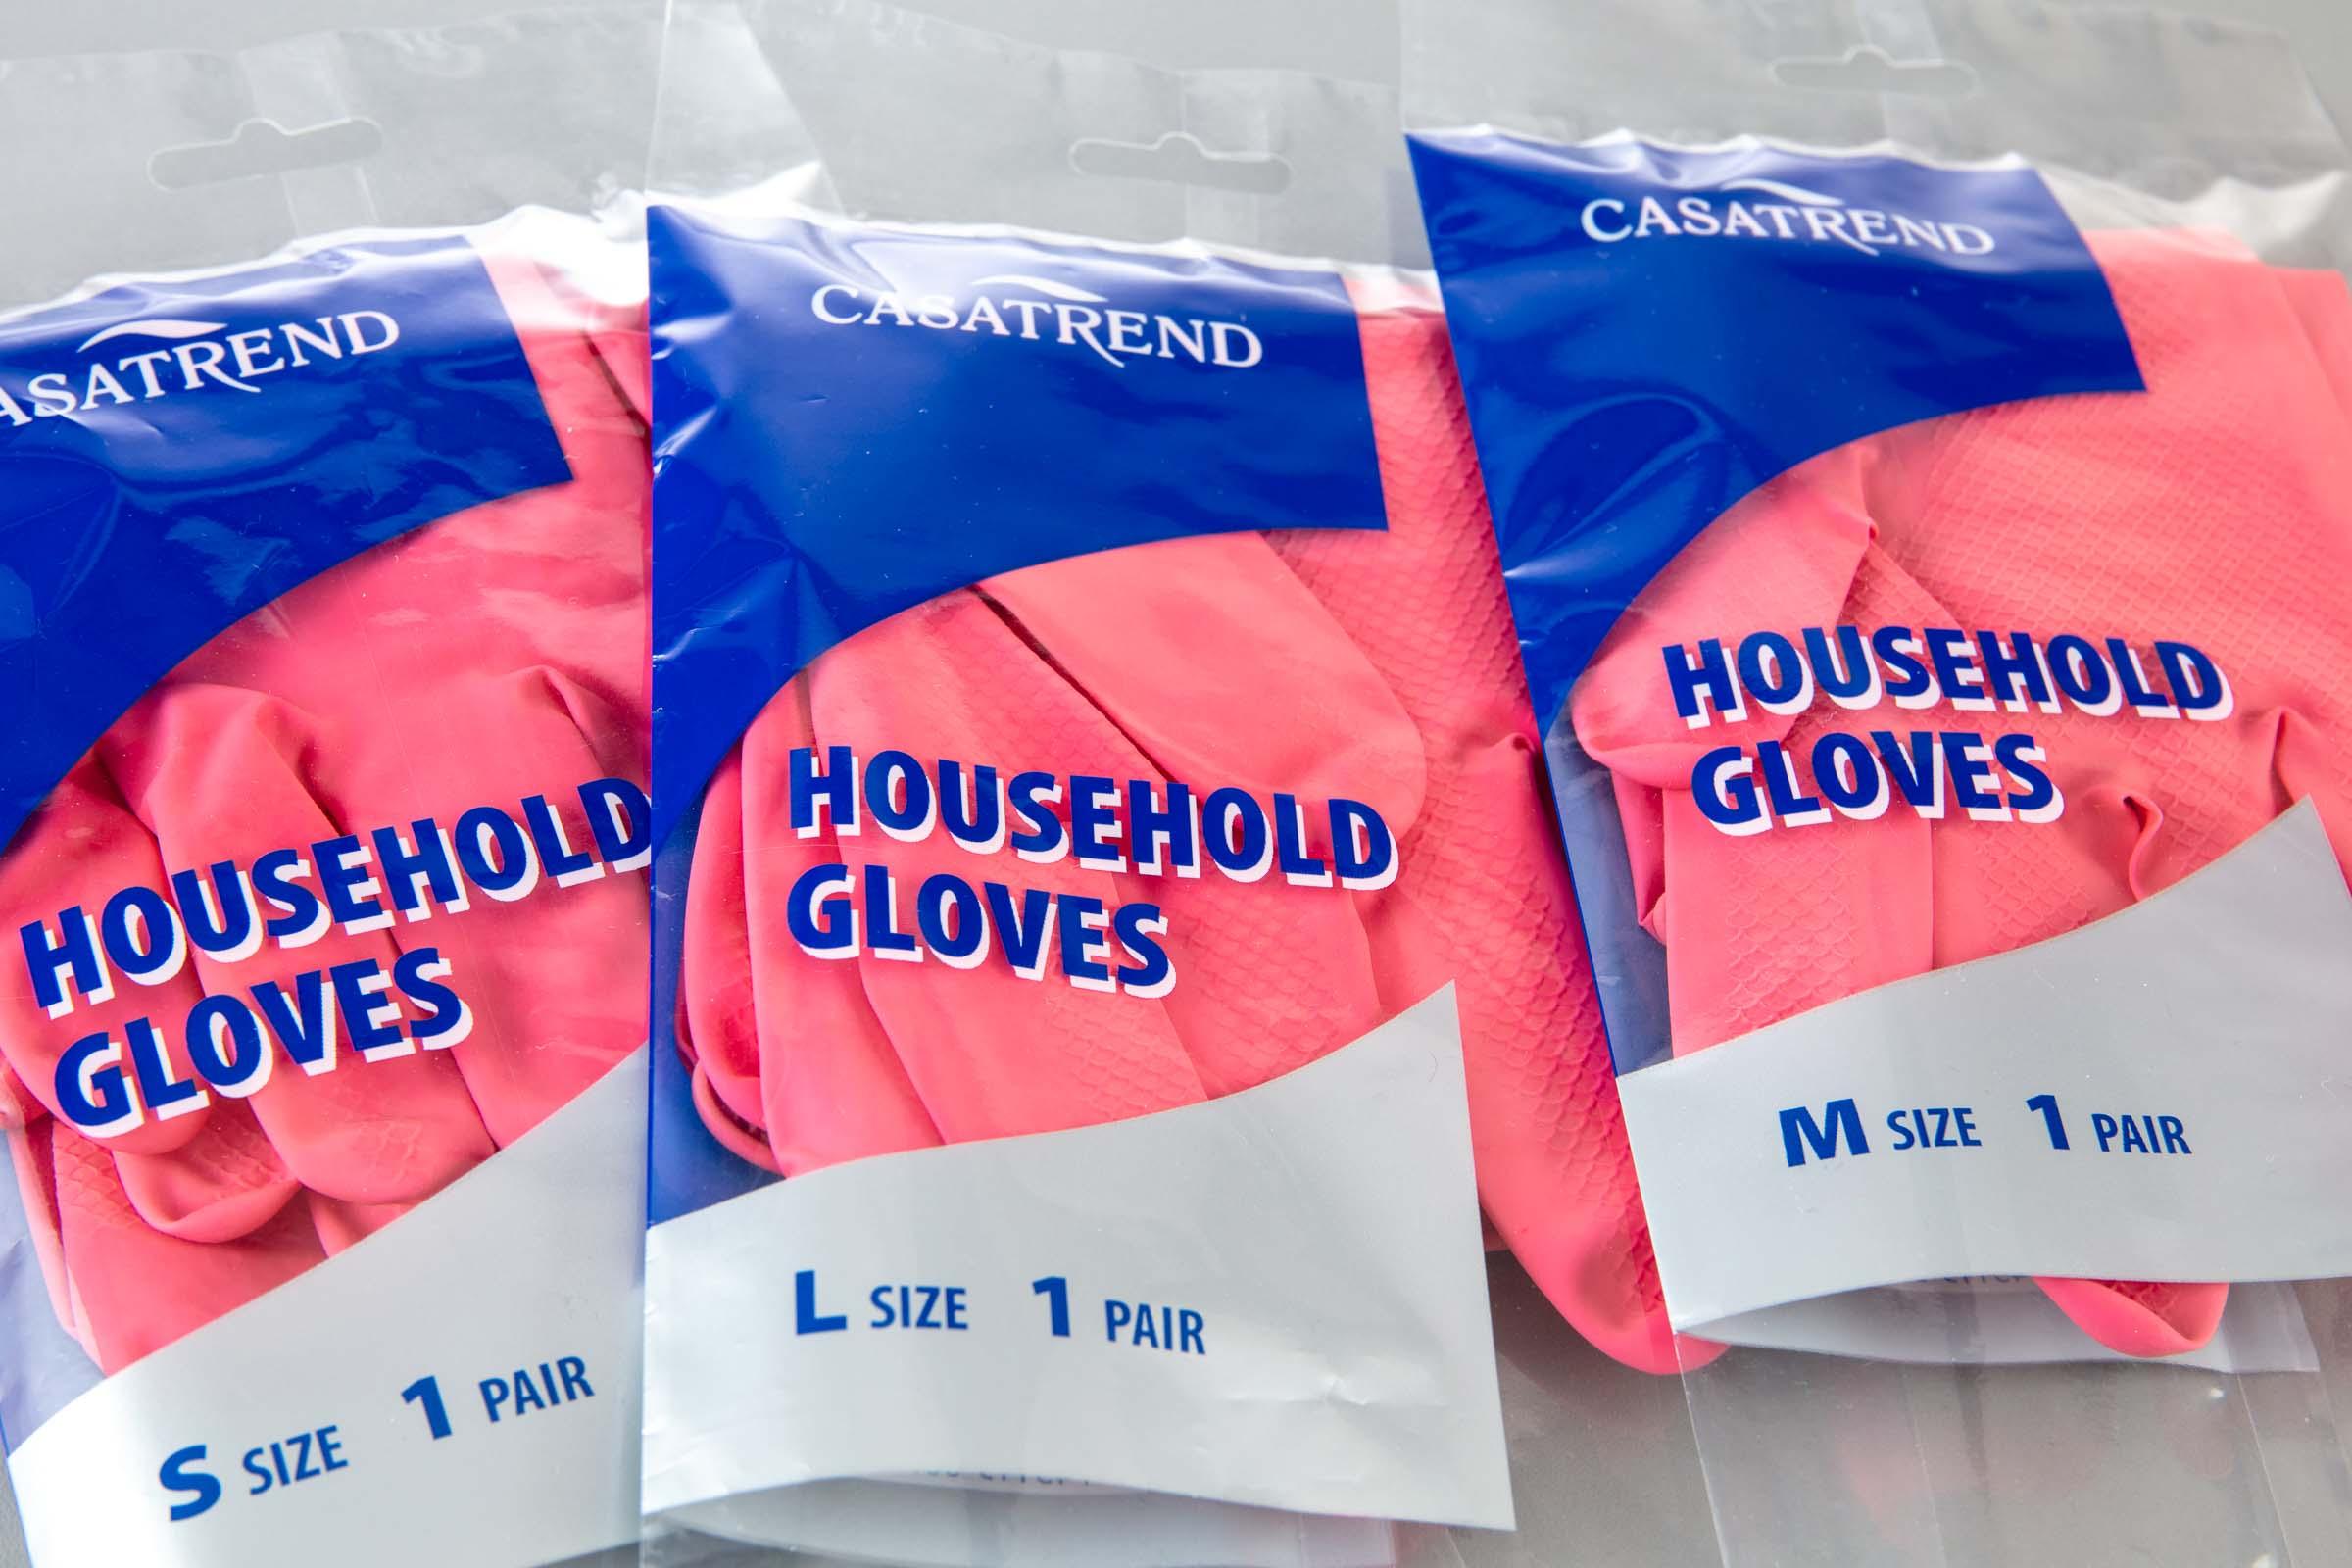 Casatrend - Household Gloves